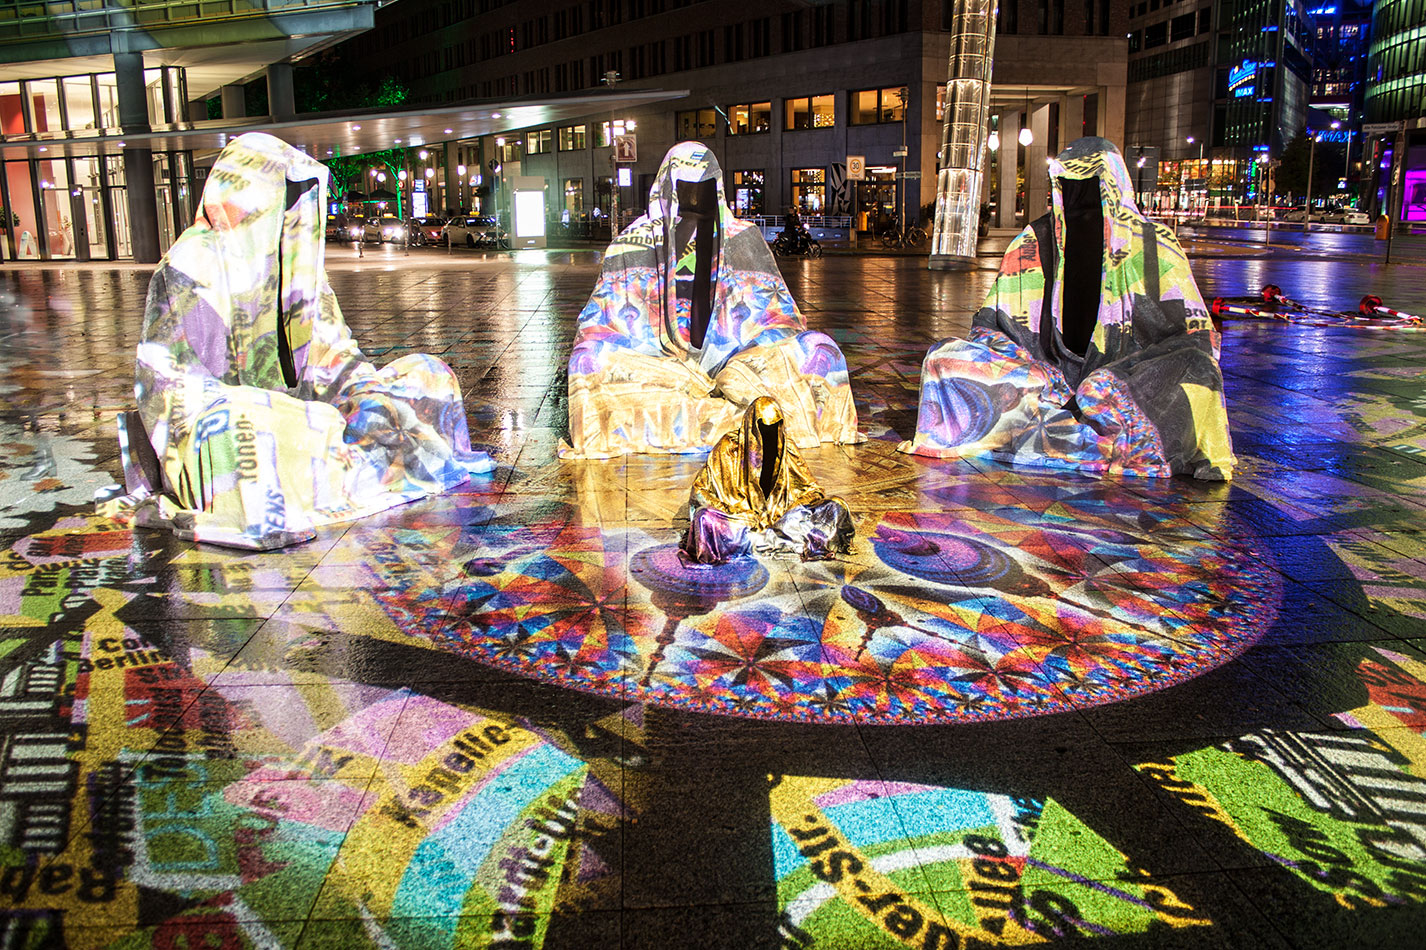 festival-of-lights-berlin-light-art-festival-contemporary-fine-art-design-show-large-scale-sculpture-guardiansof-time-manfred-kili-kielnhofer-sculpture-3872